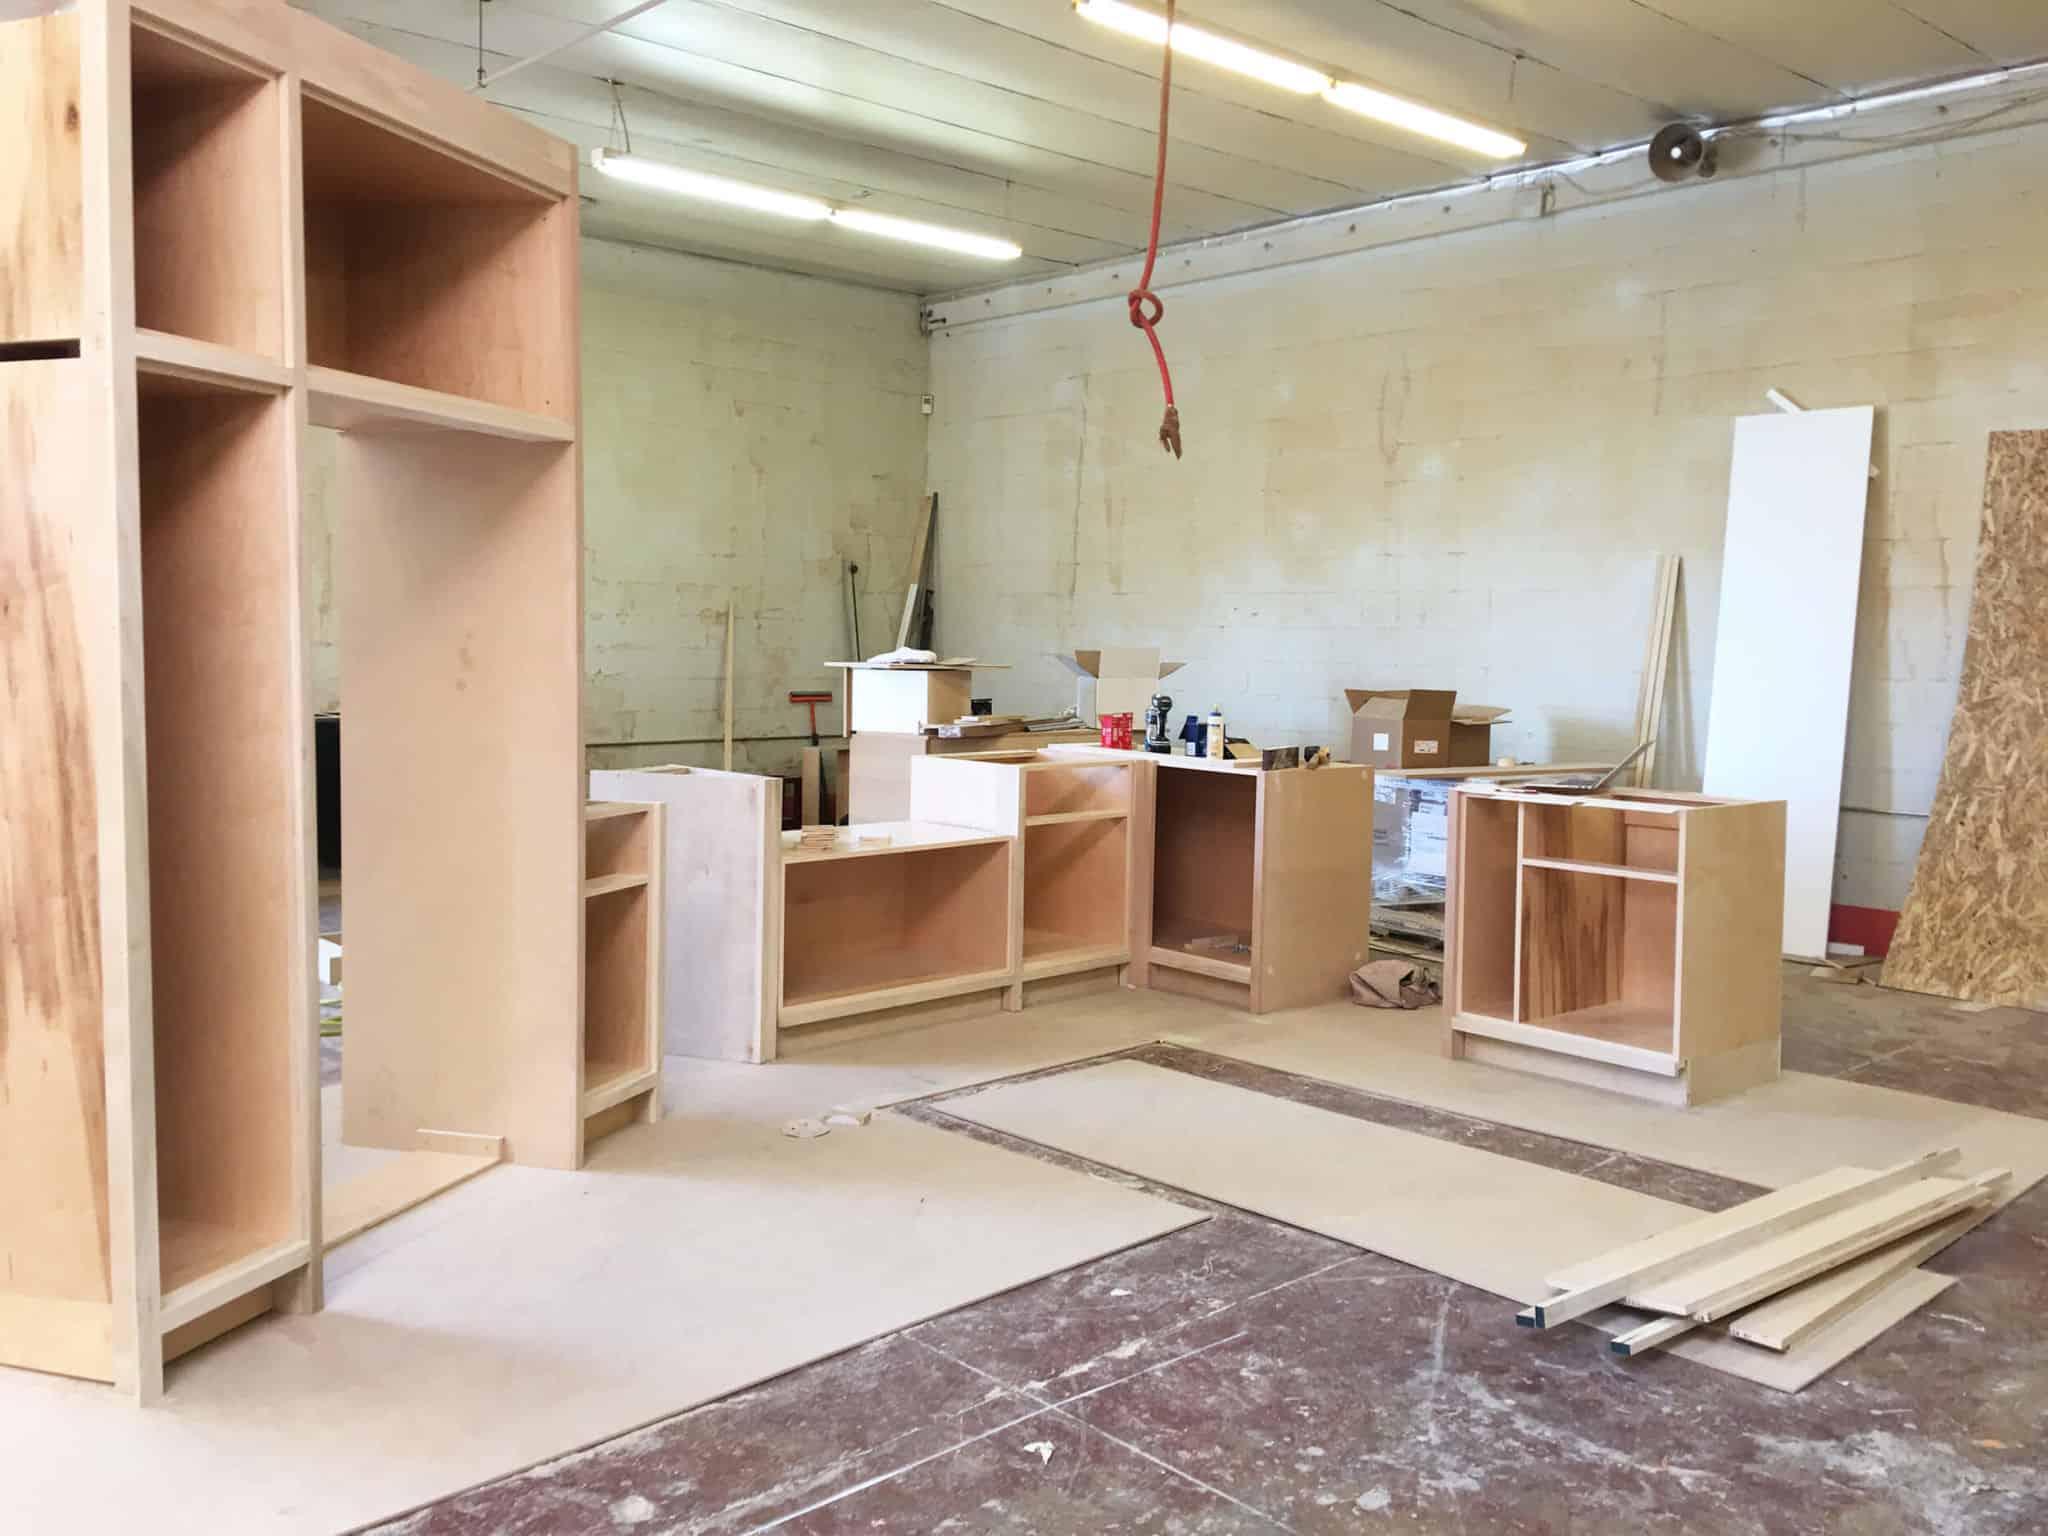 emily-henderson_cabinet-progress_visit-to-shop_pictures-2